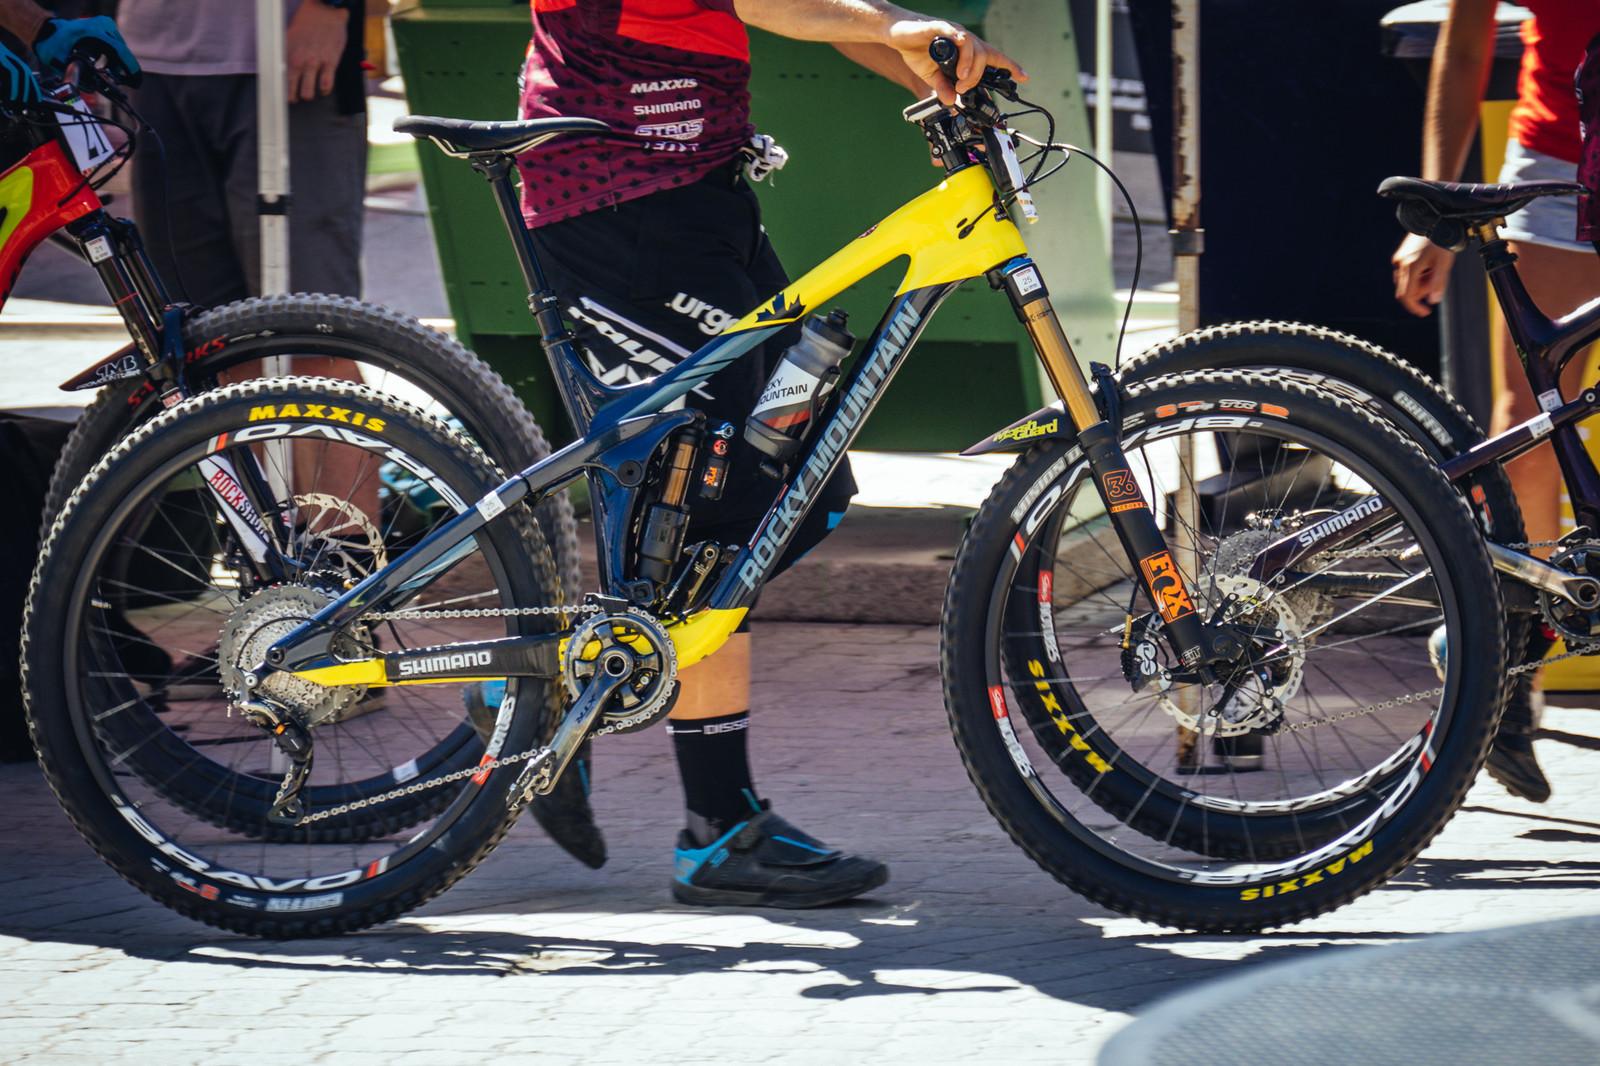 2017 Rocky Mountain Slayer - PIT BITS - Enduro World Series, Whistler - Mountain Biking Pictures - Vital MTB